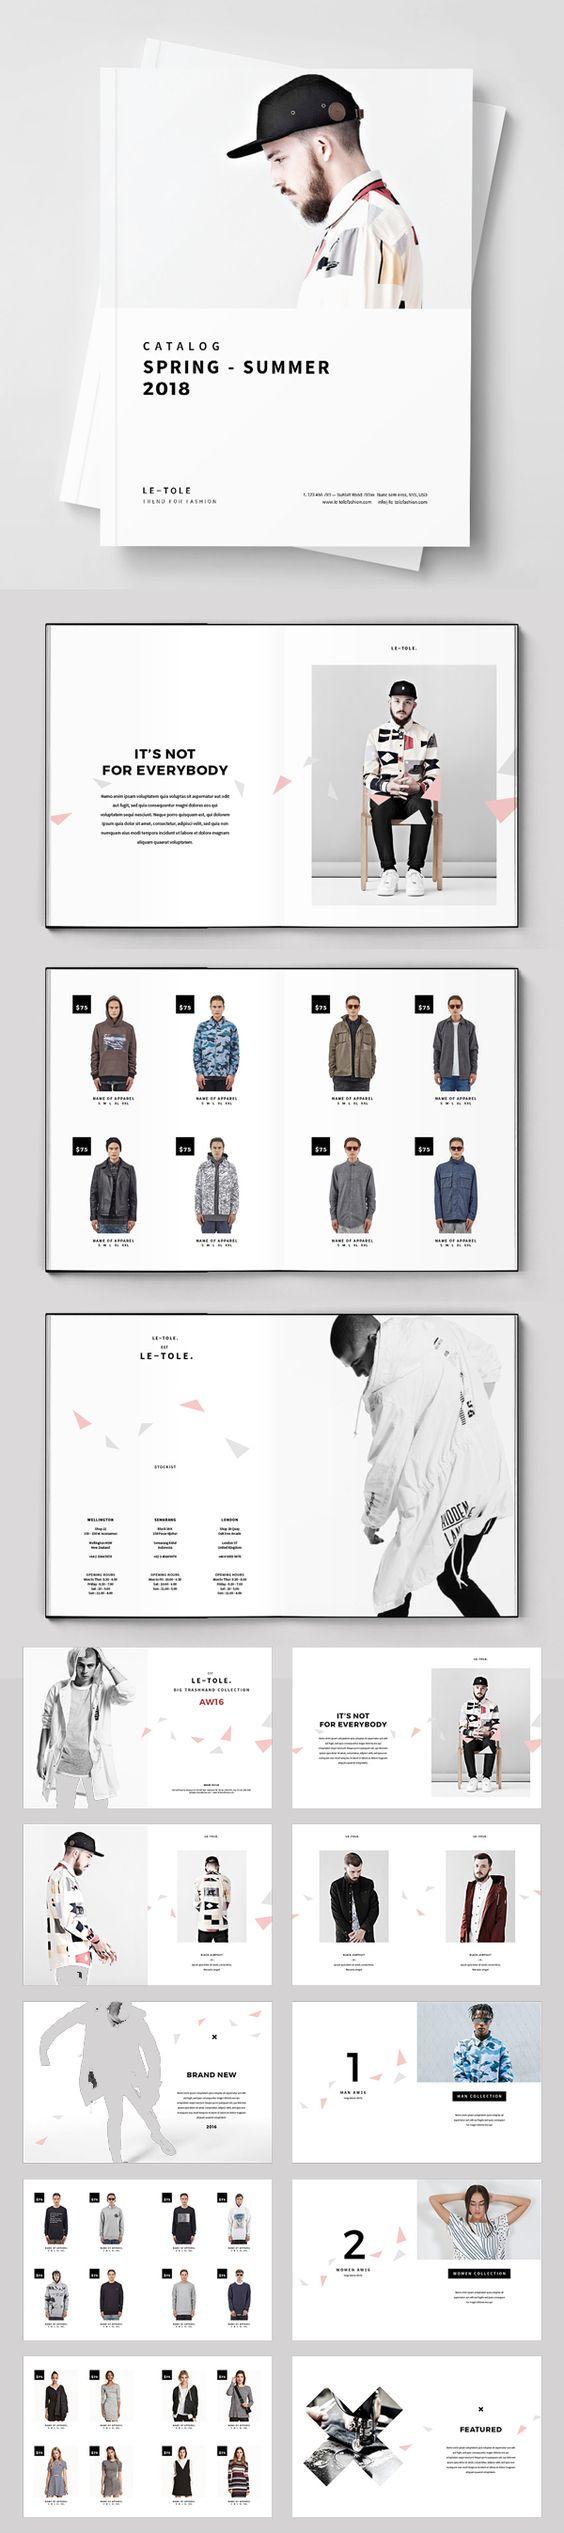 folleto producto 3